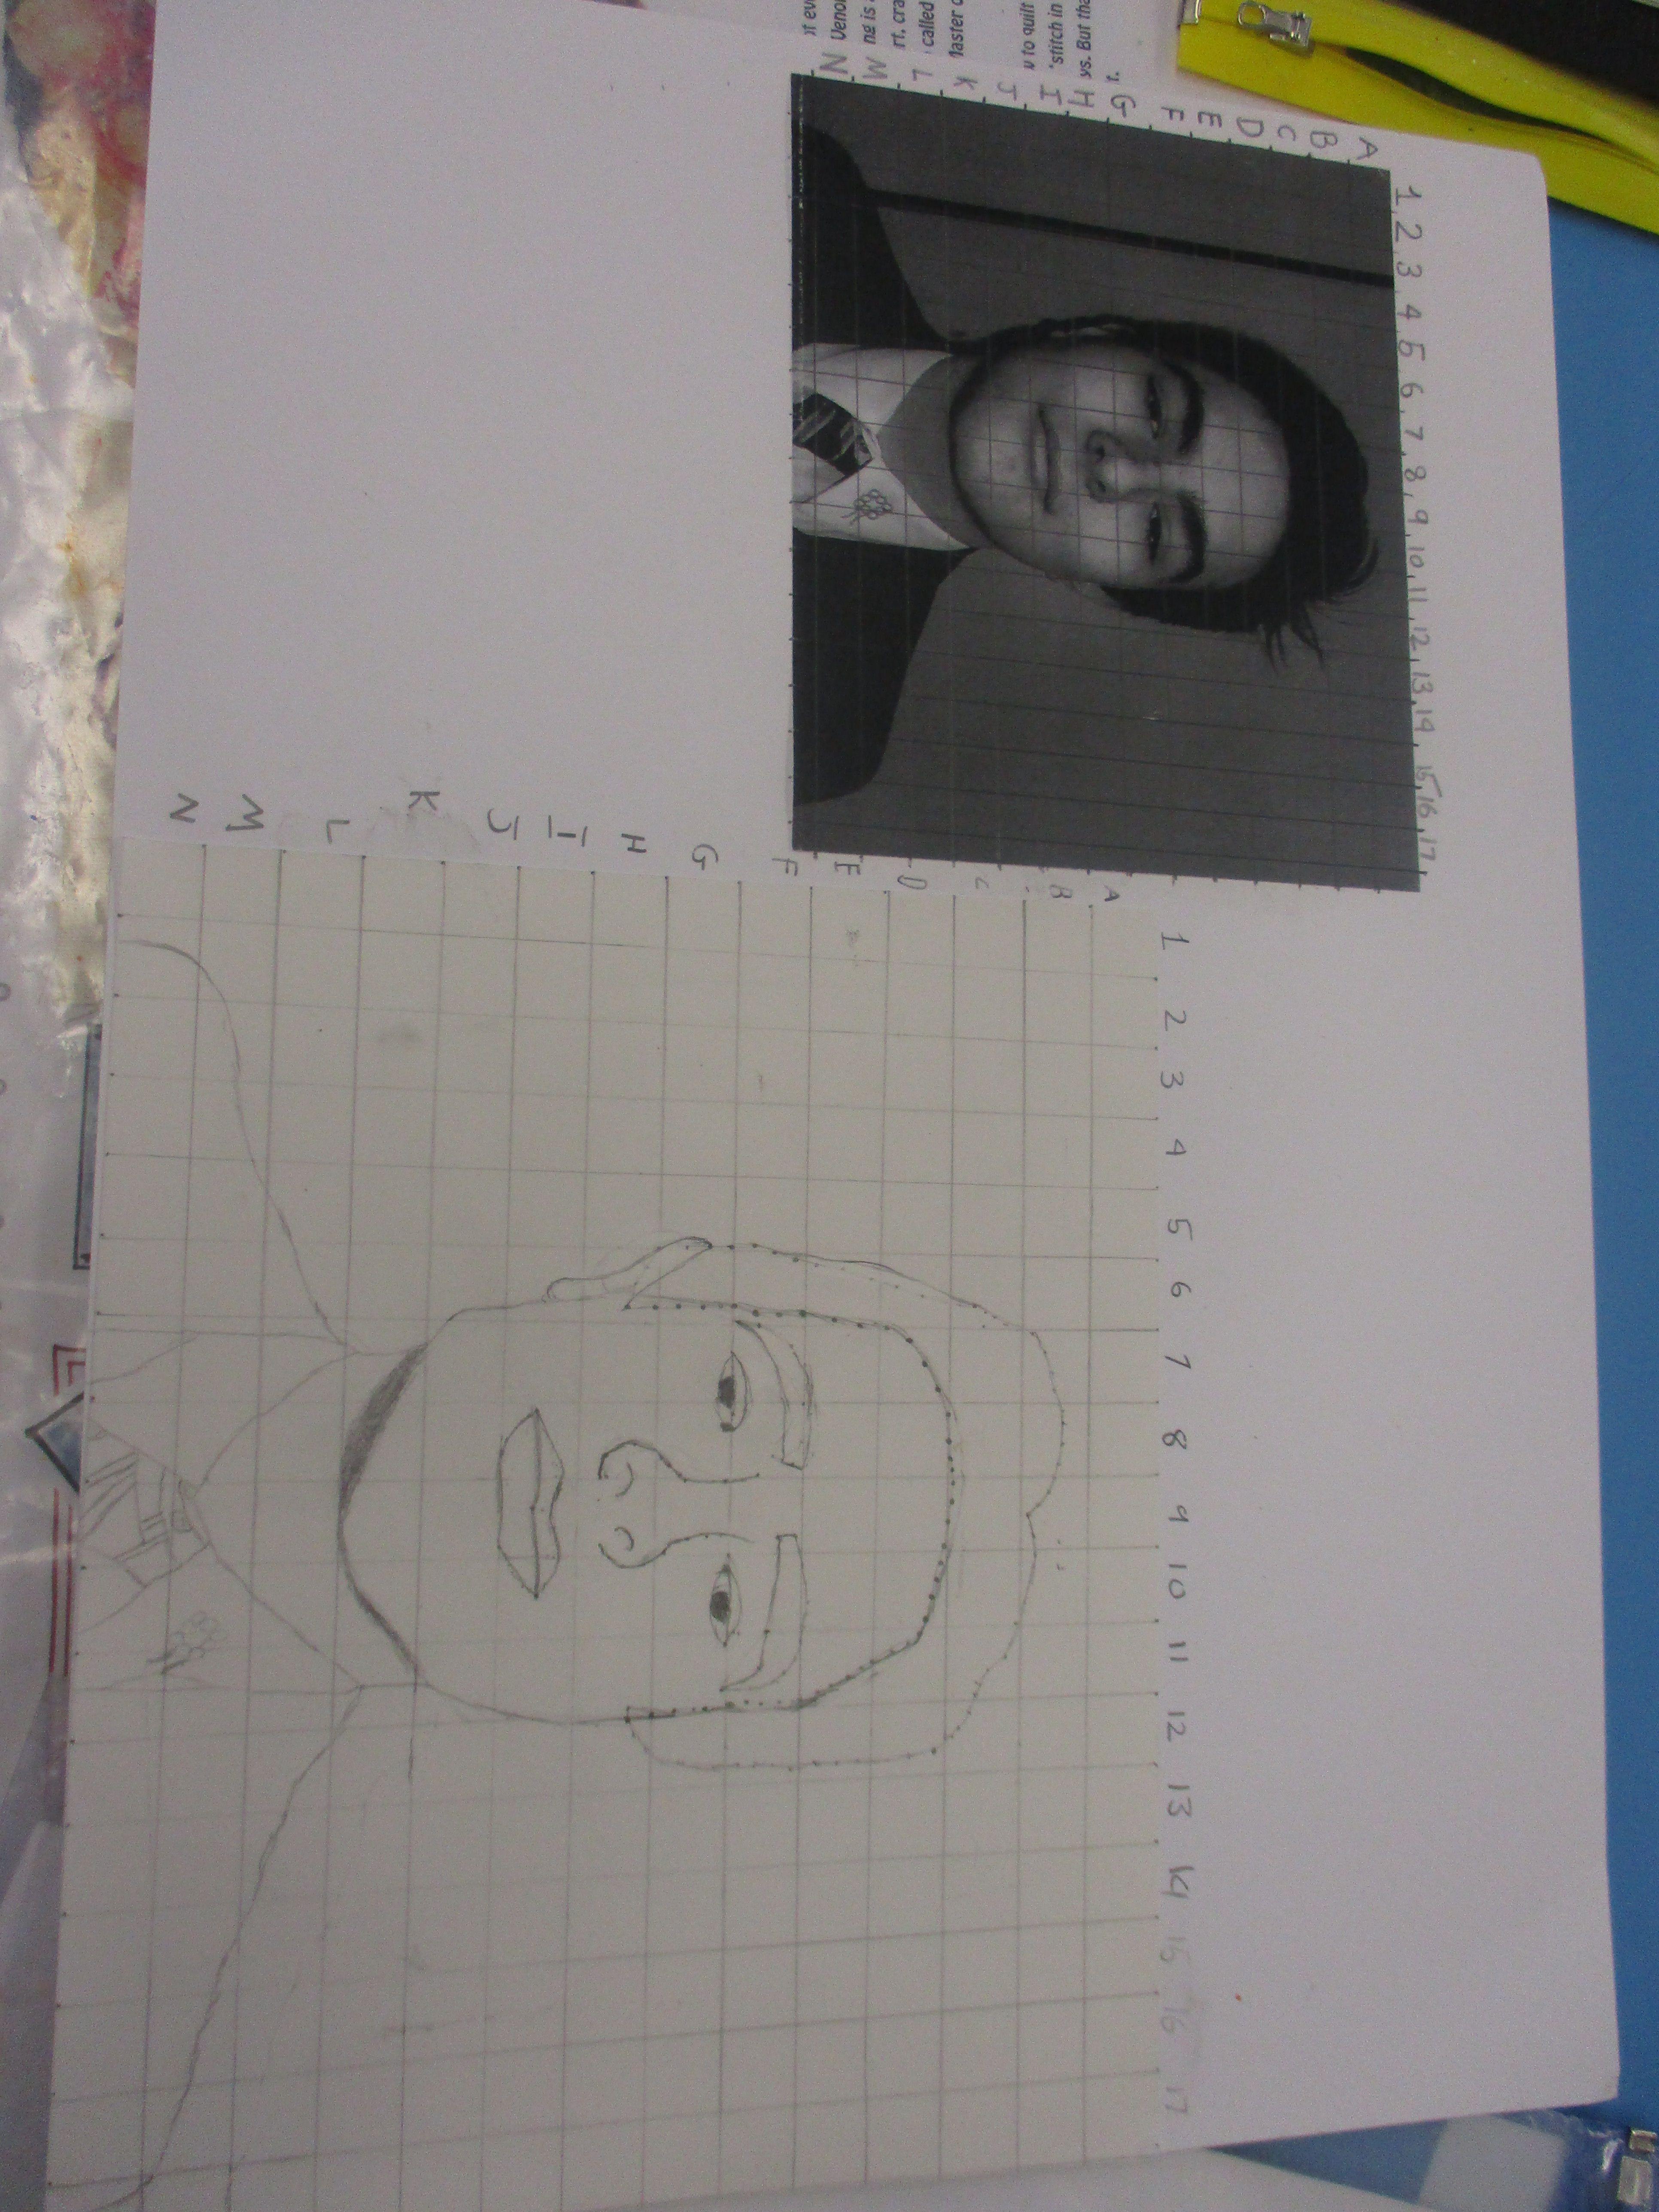 Tonal Drawing Of Portraits Using The Grid Method